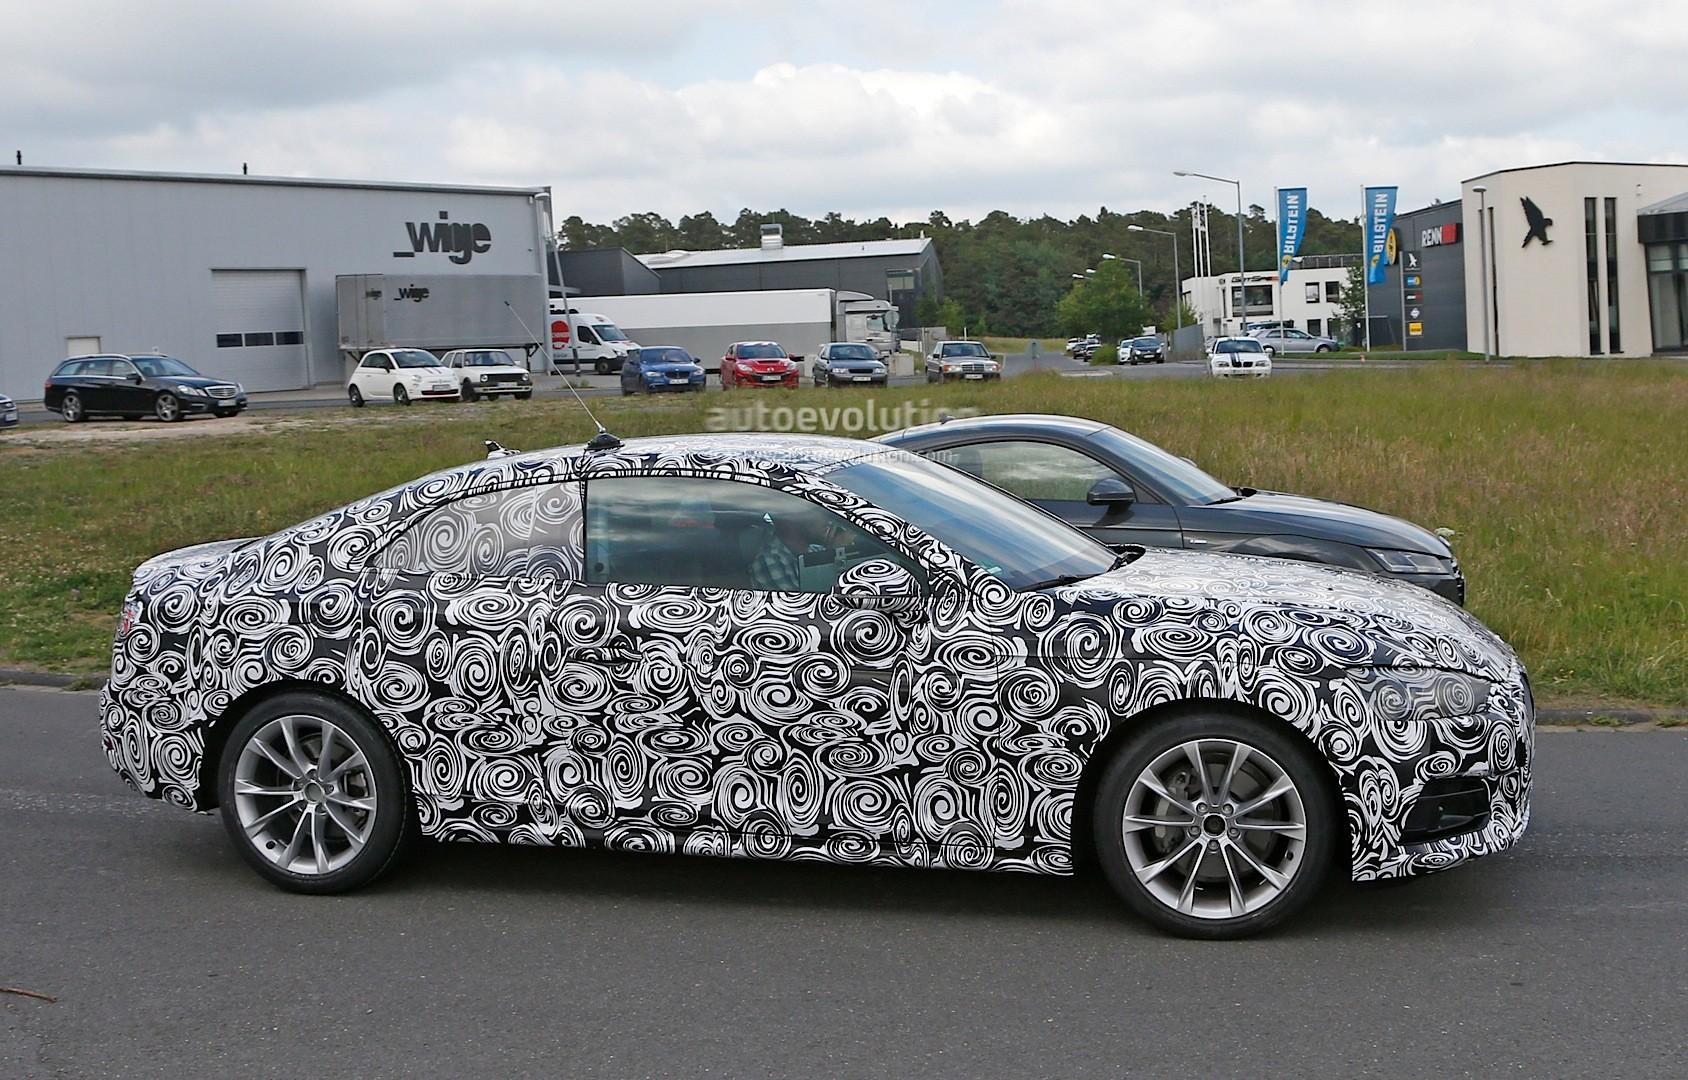 2016 - [Audi] A5 Coupé, Cabriolet et Sportback - Page 2 All-new-2017-audi-a5-coupe-first-spy-photos-show-evolutionary-design_4